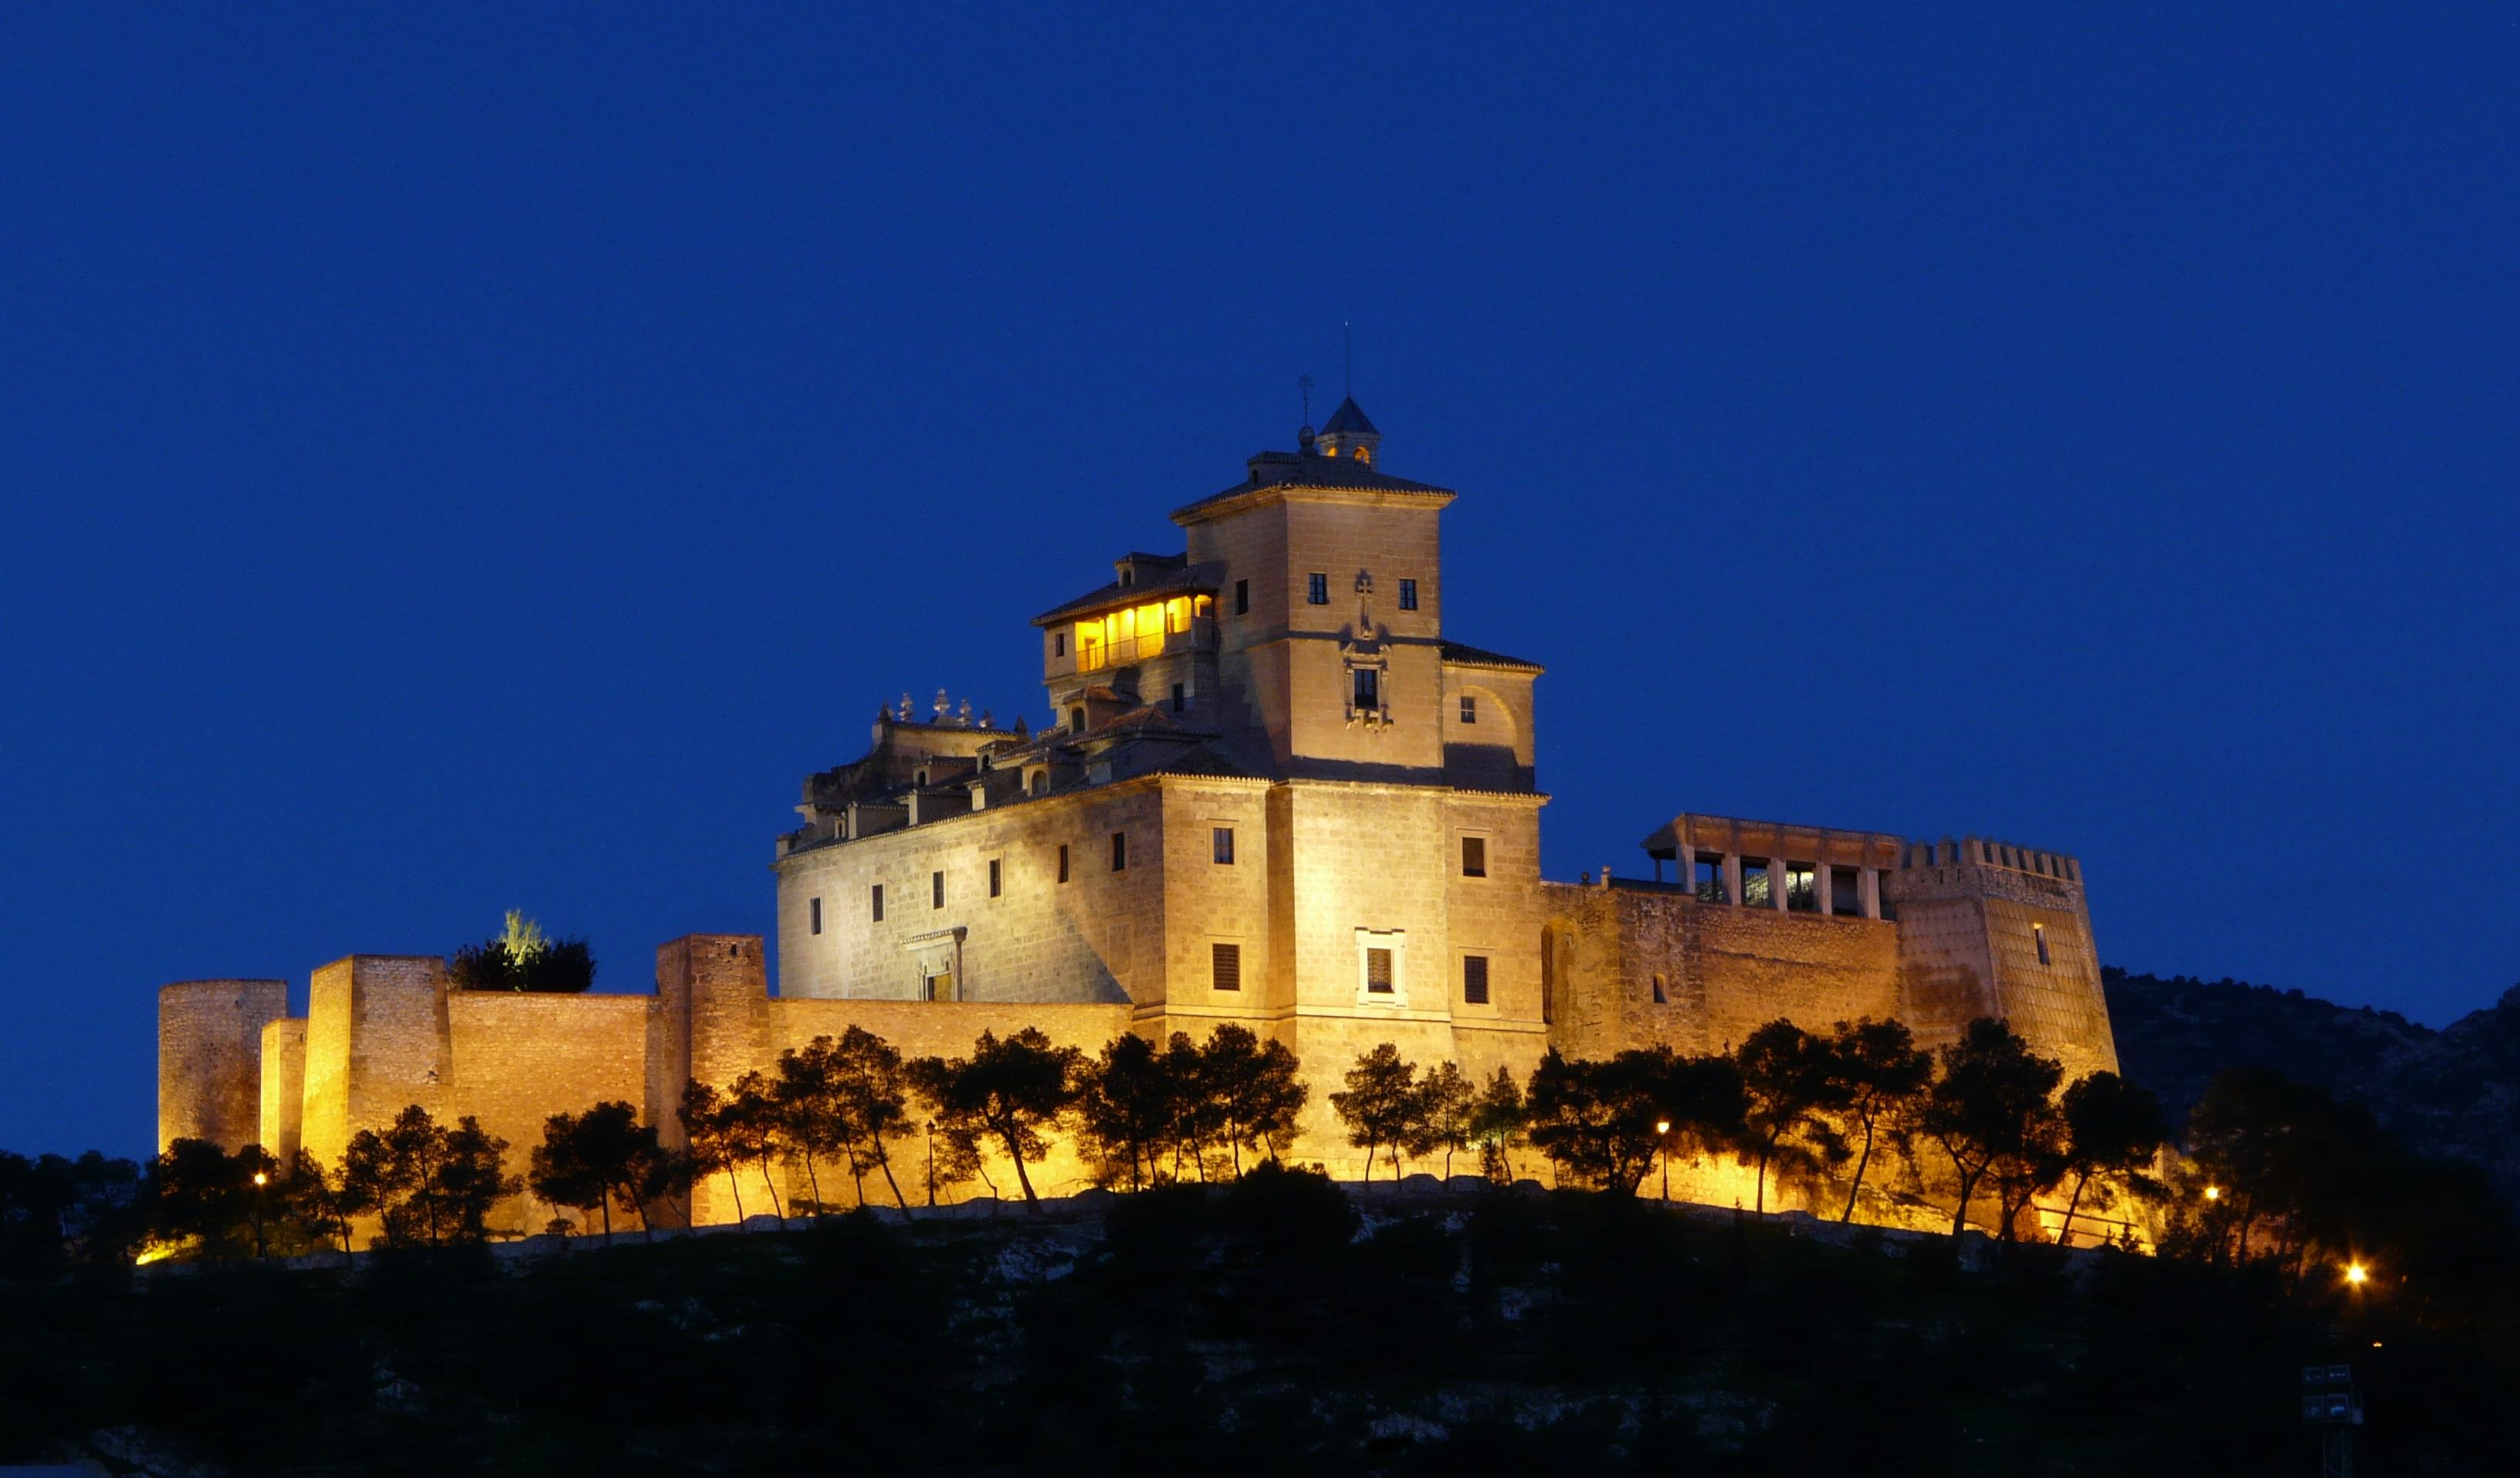 Castillo_Santuario_de_la_Vera_Cruz_de_Caravaca_de_la_Cruz.jpg